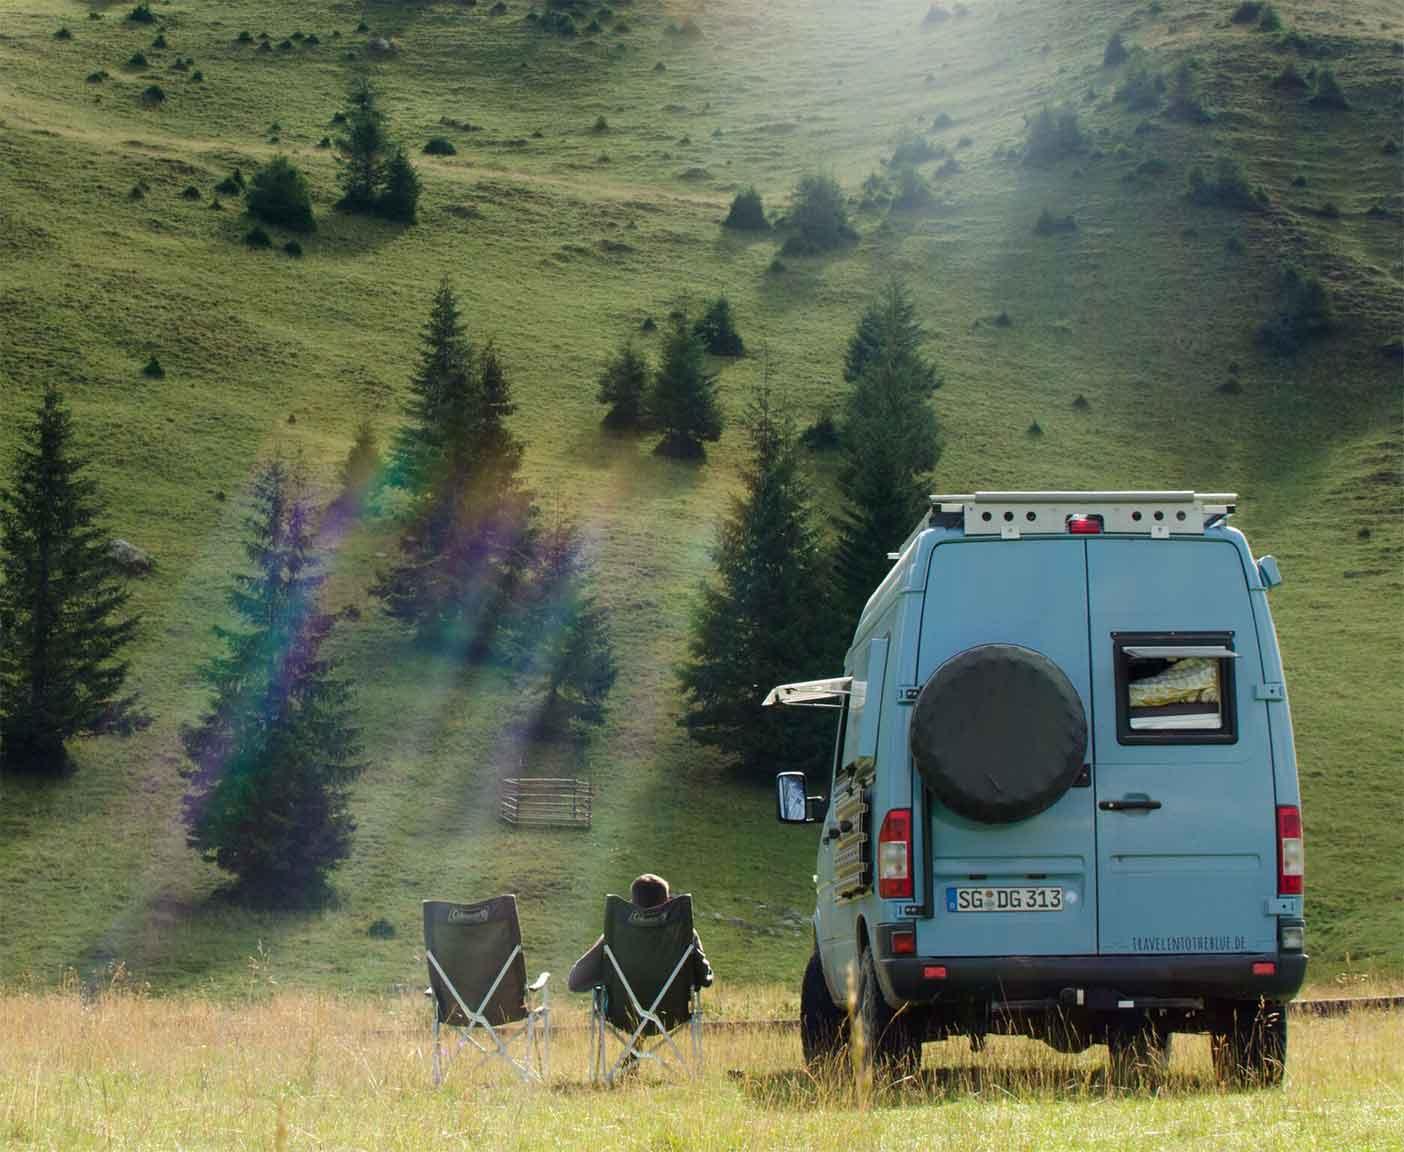 mercedes-sprinter-cdi-313-allrad-4x4-expedition-fahrzeug-fernreisemobil